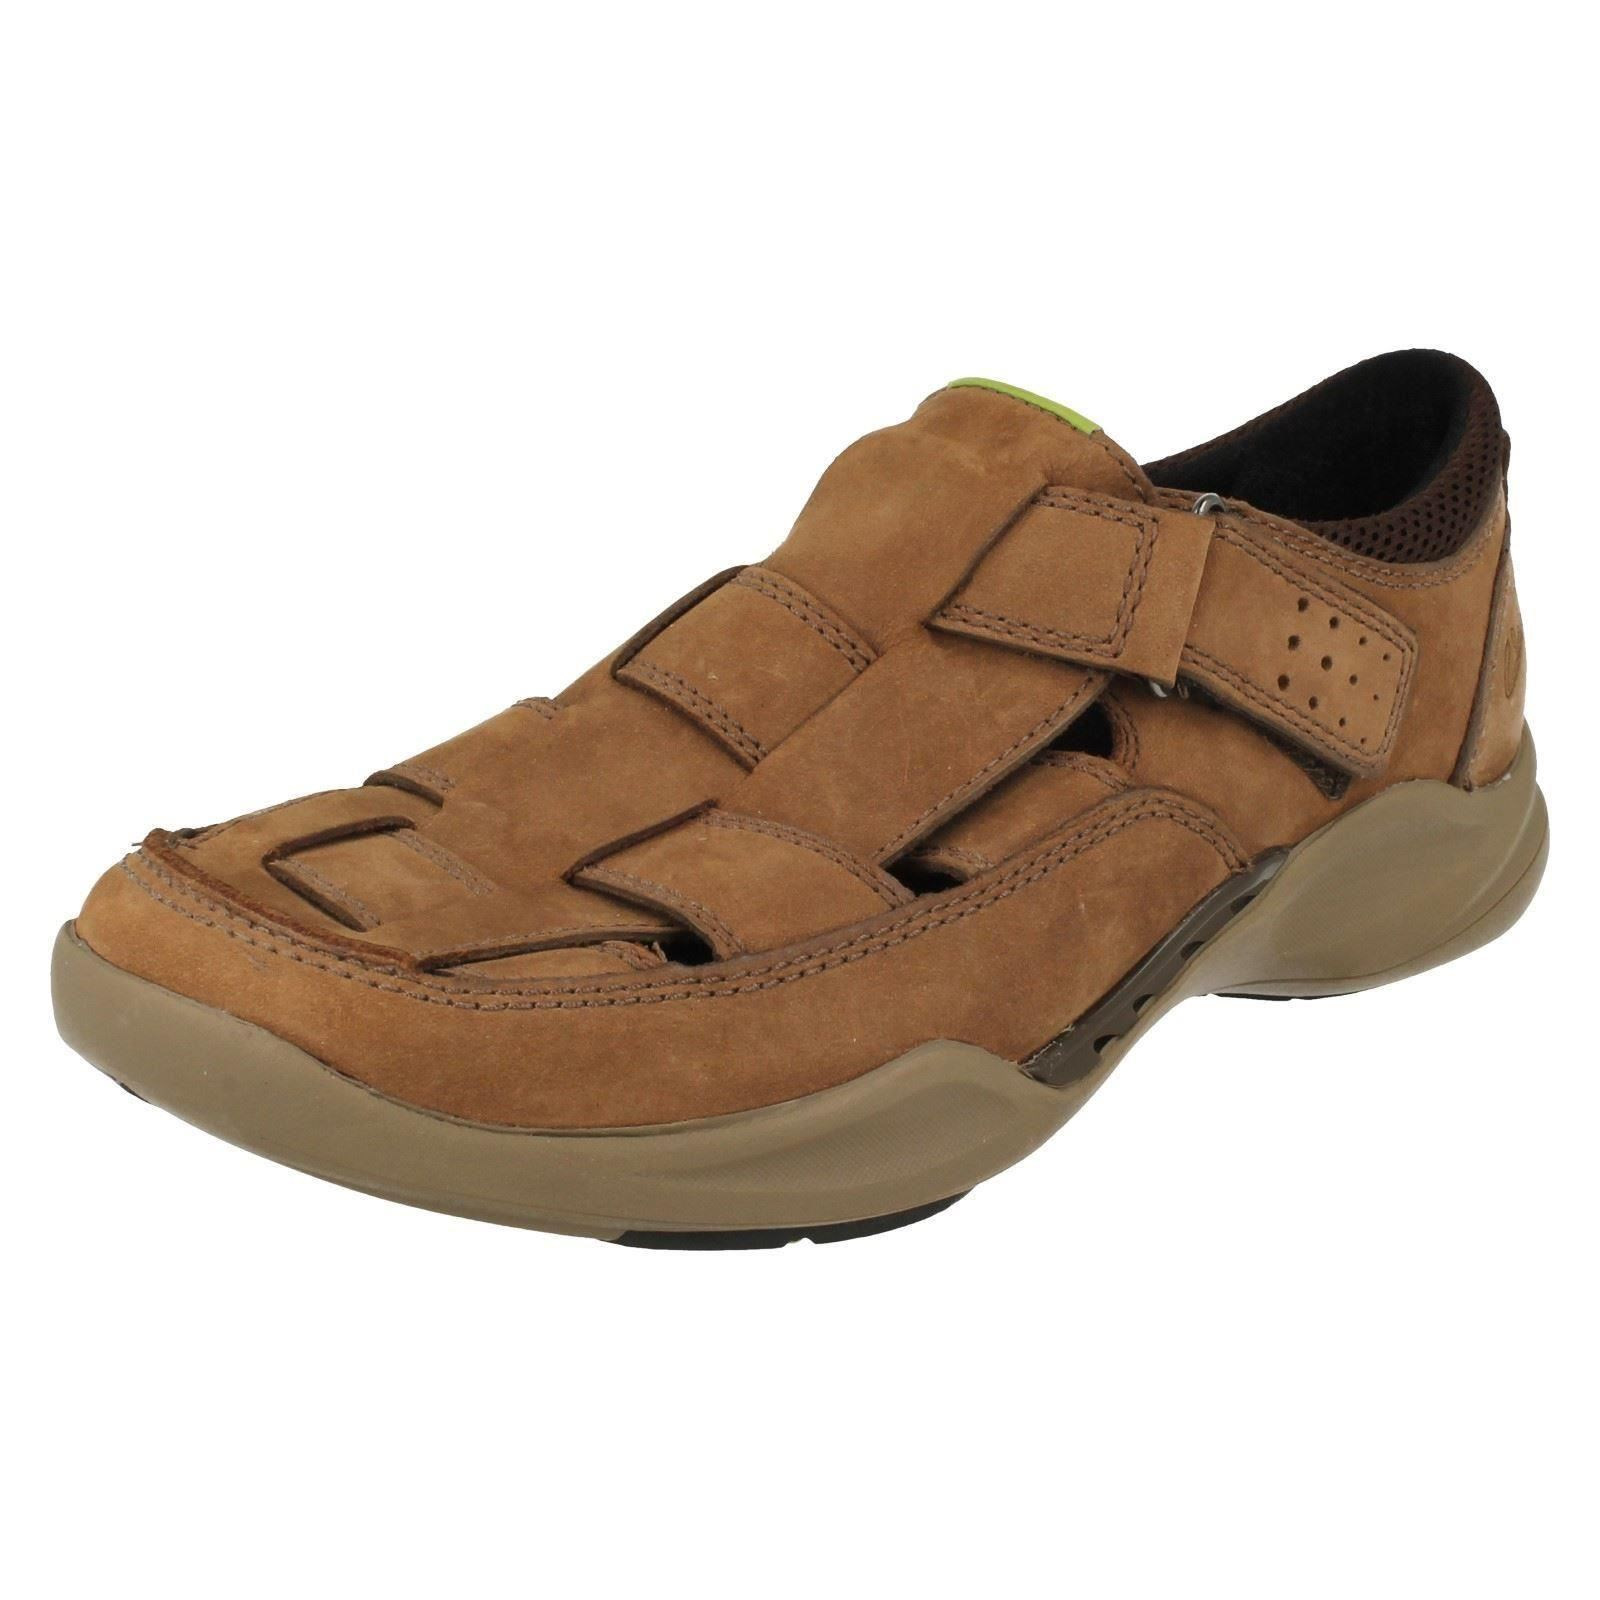 Breeze Ebony con Clarks marrone chiusa Mens Walk Sandali punta Wave g6q7xAFa